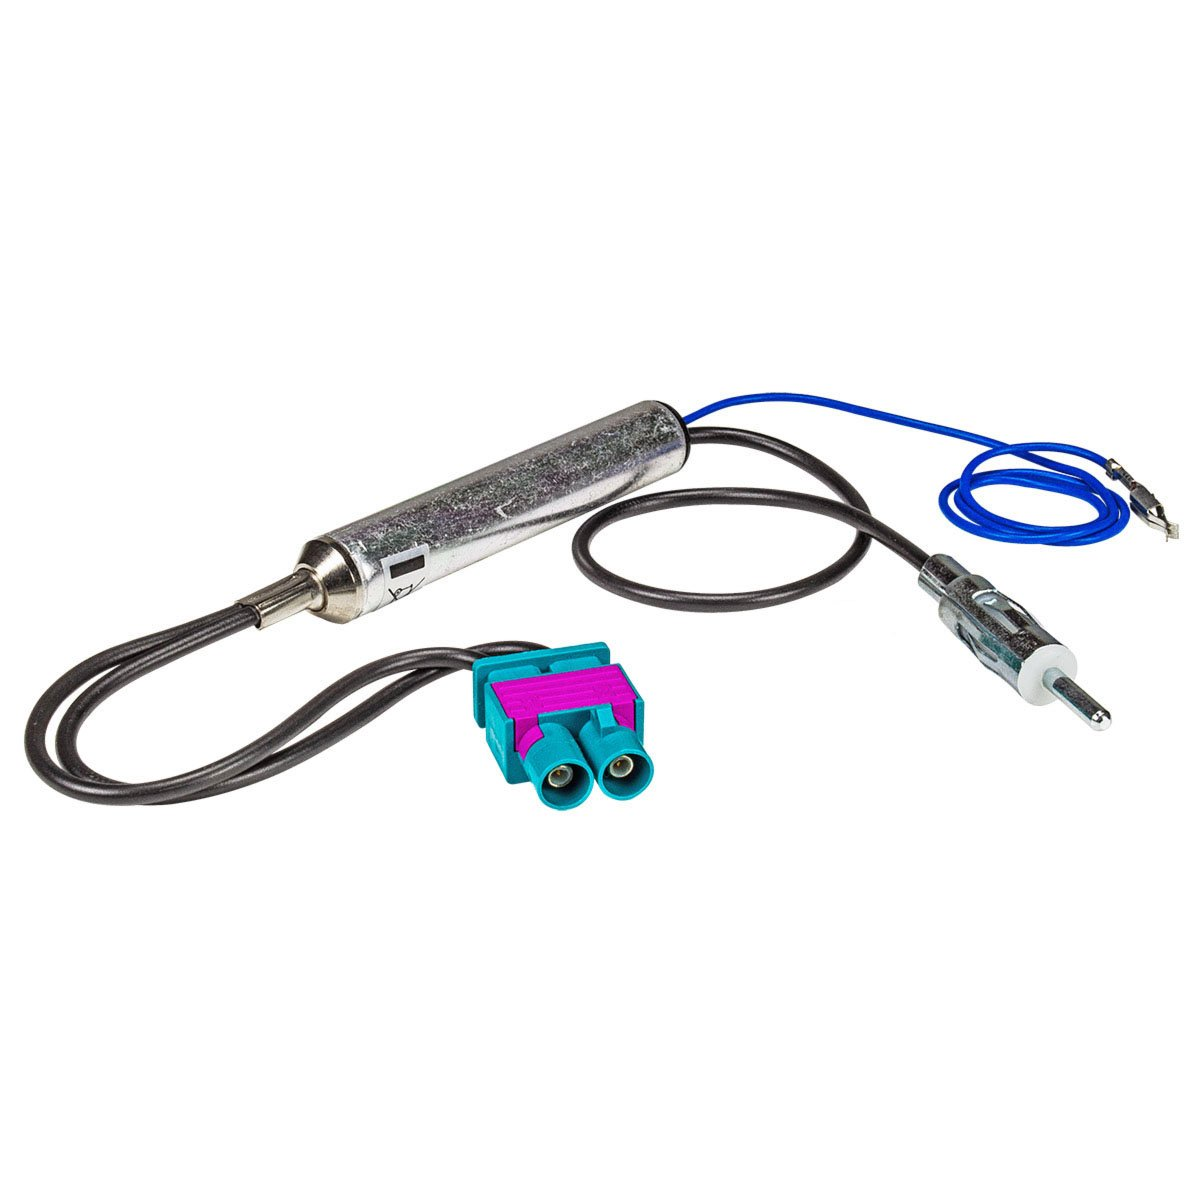 tomzz Audio 1503-007 Doppel Fakra Antennenadapter mit Phantomeinspeisung f/ür Audi Seat Skoda VW Citroen Peugeot Opel auf DIN